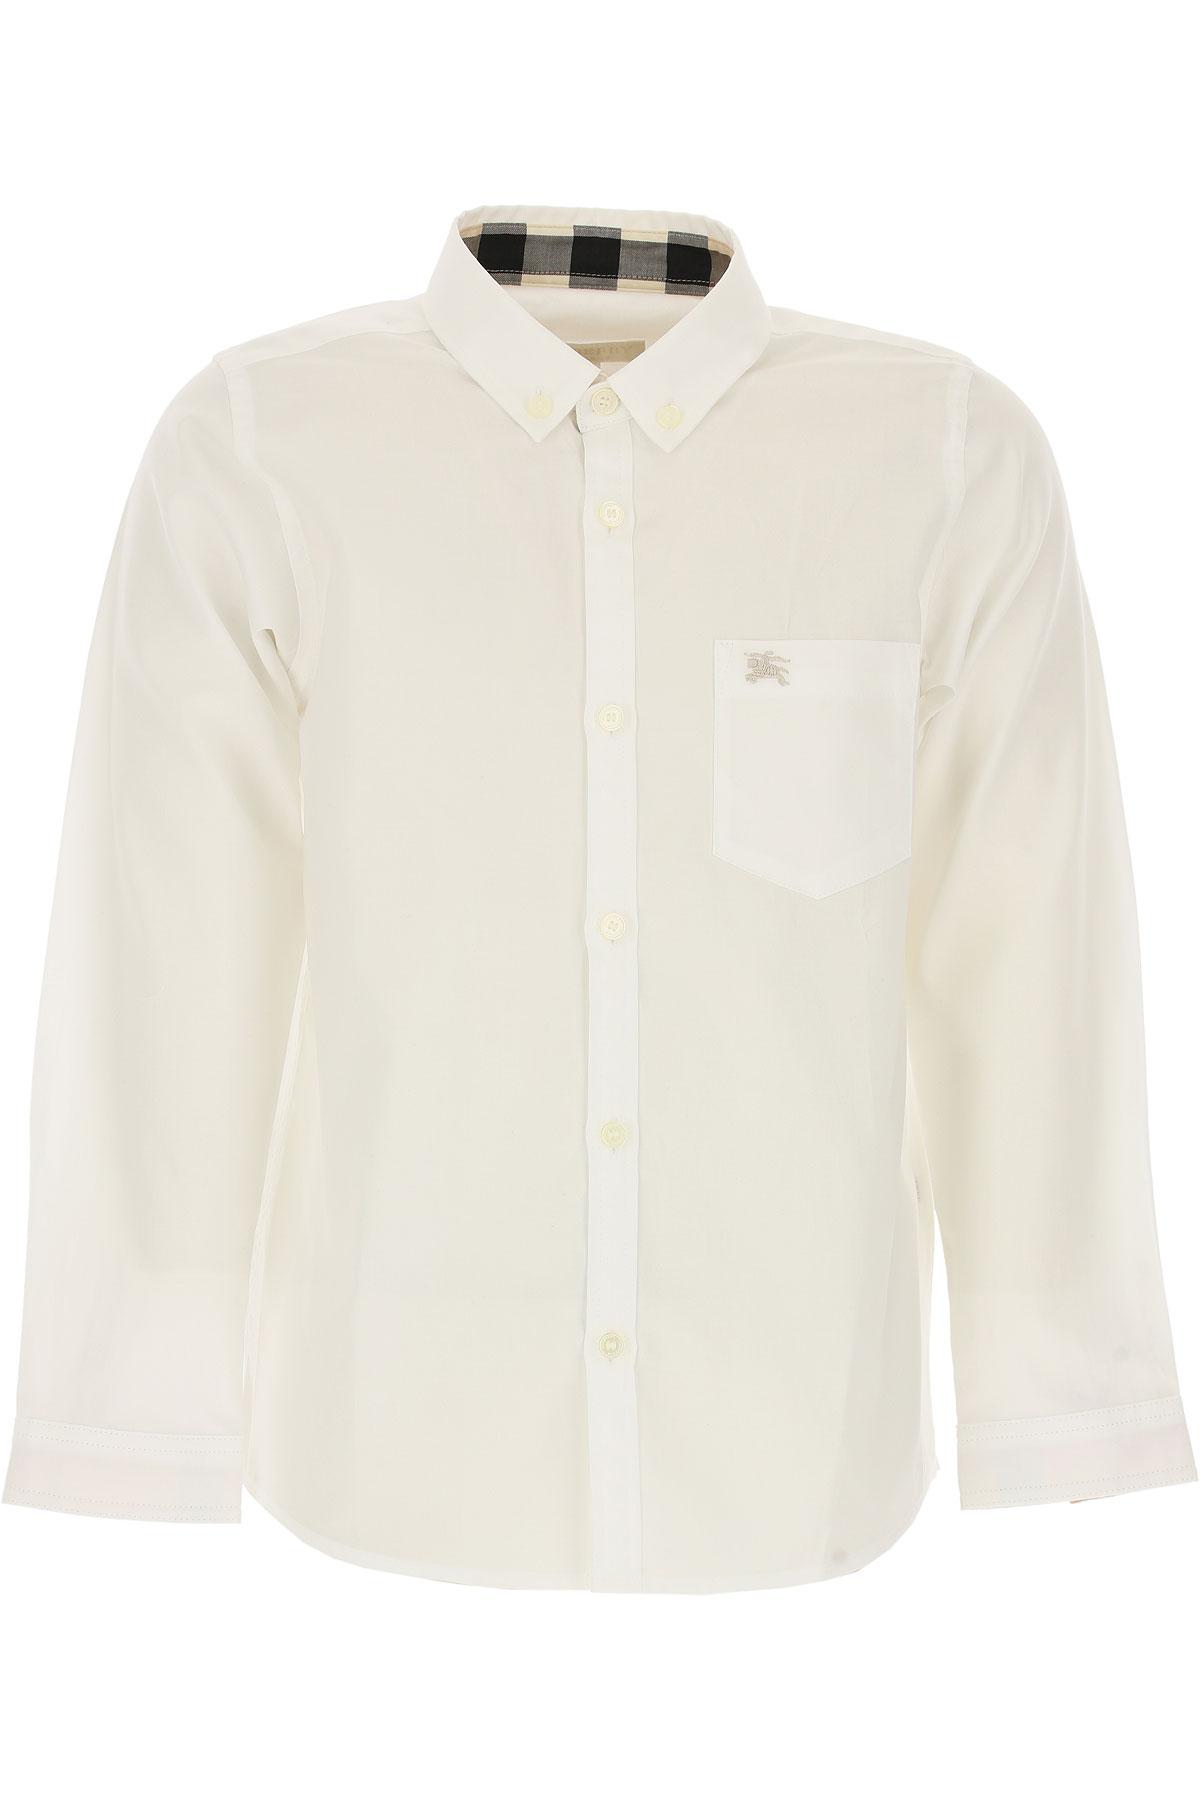 Image of Burberry Kids Shirts for Boys, White, Cotton, 2017, 10Y 14Y 4Y 6Y 8Y